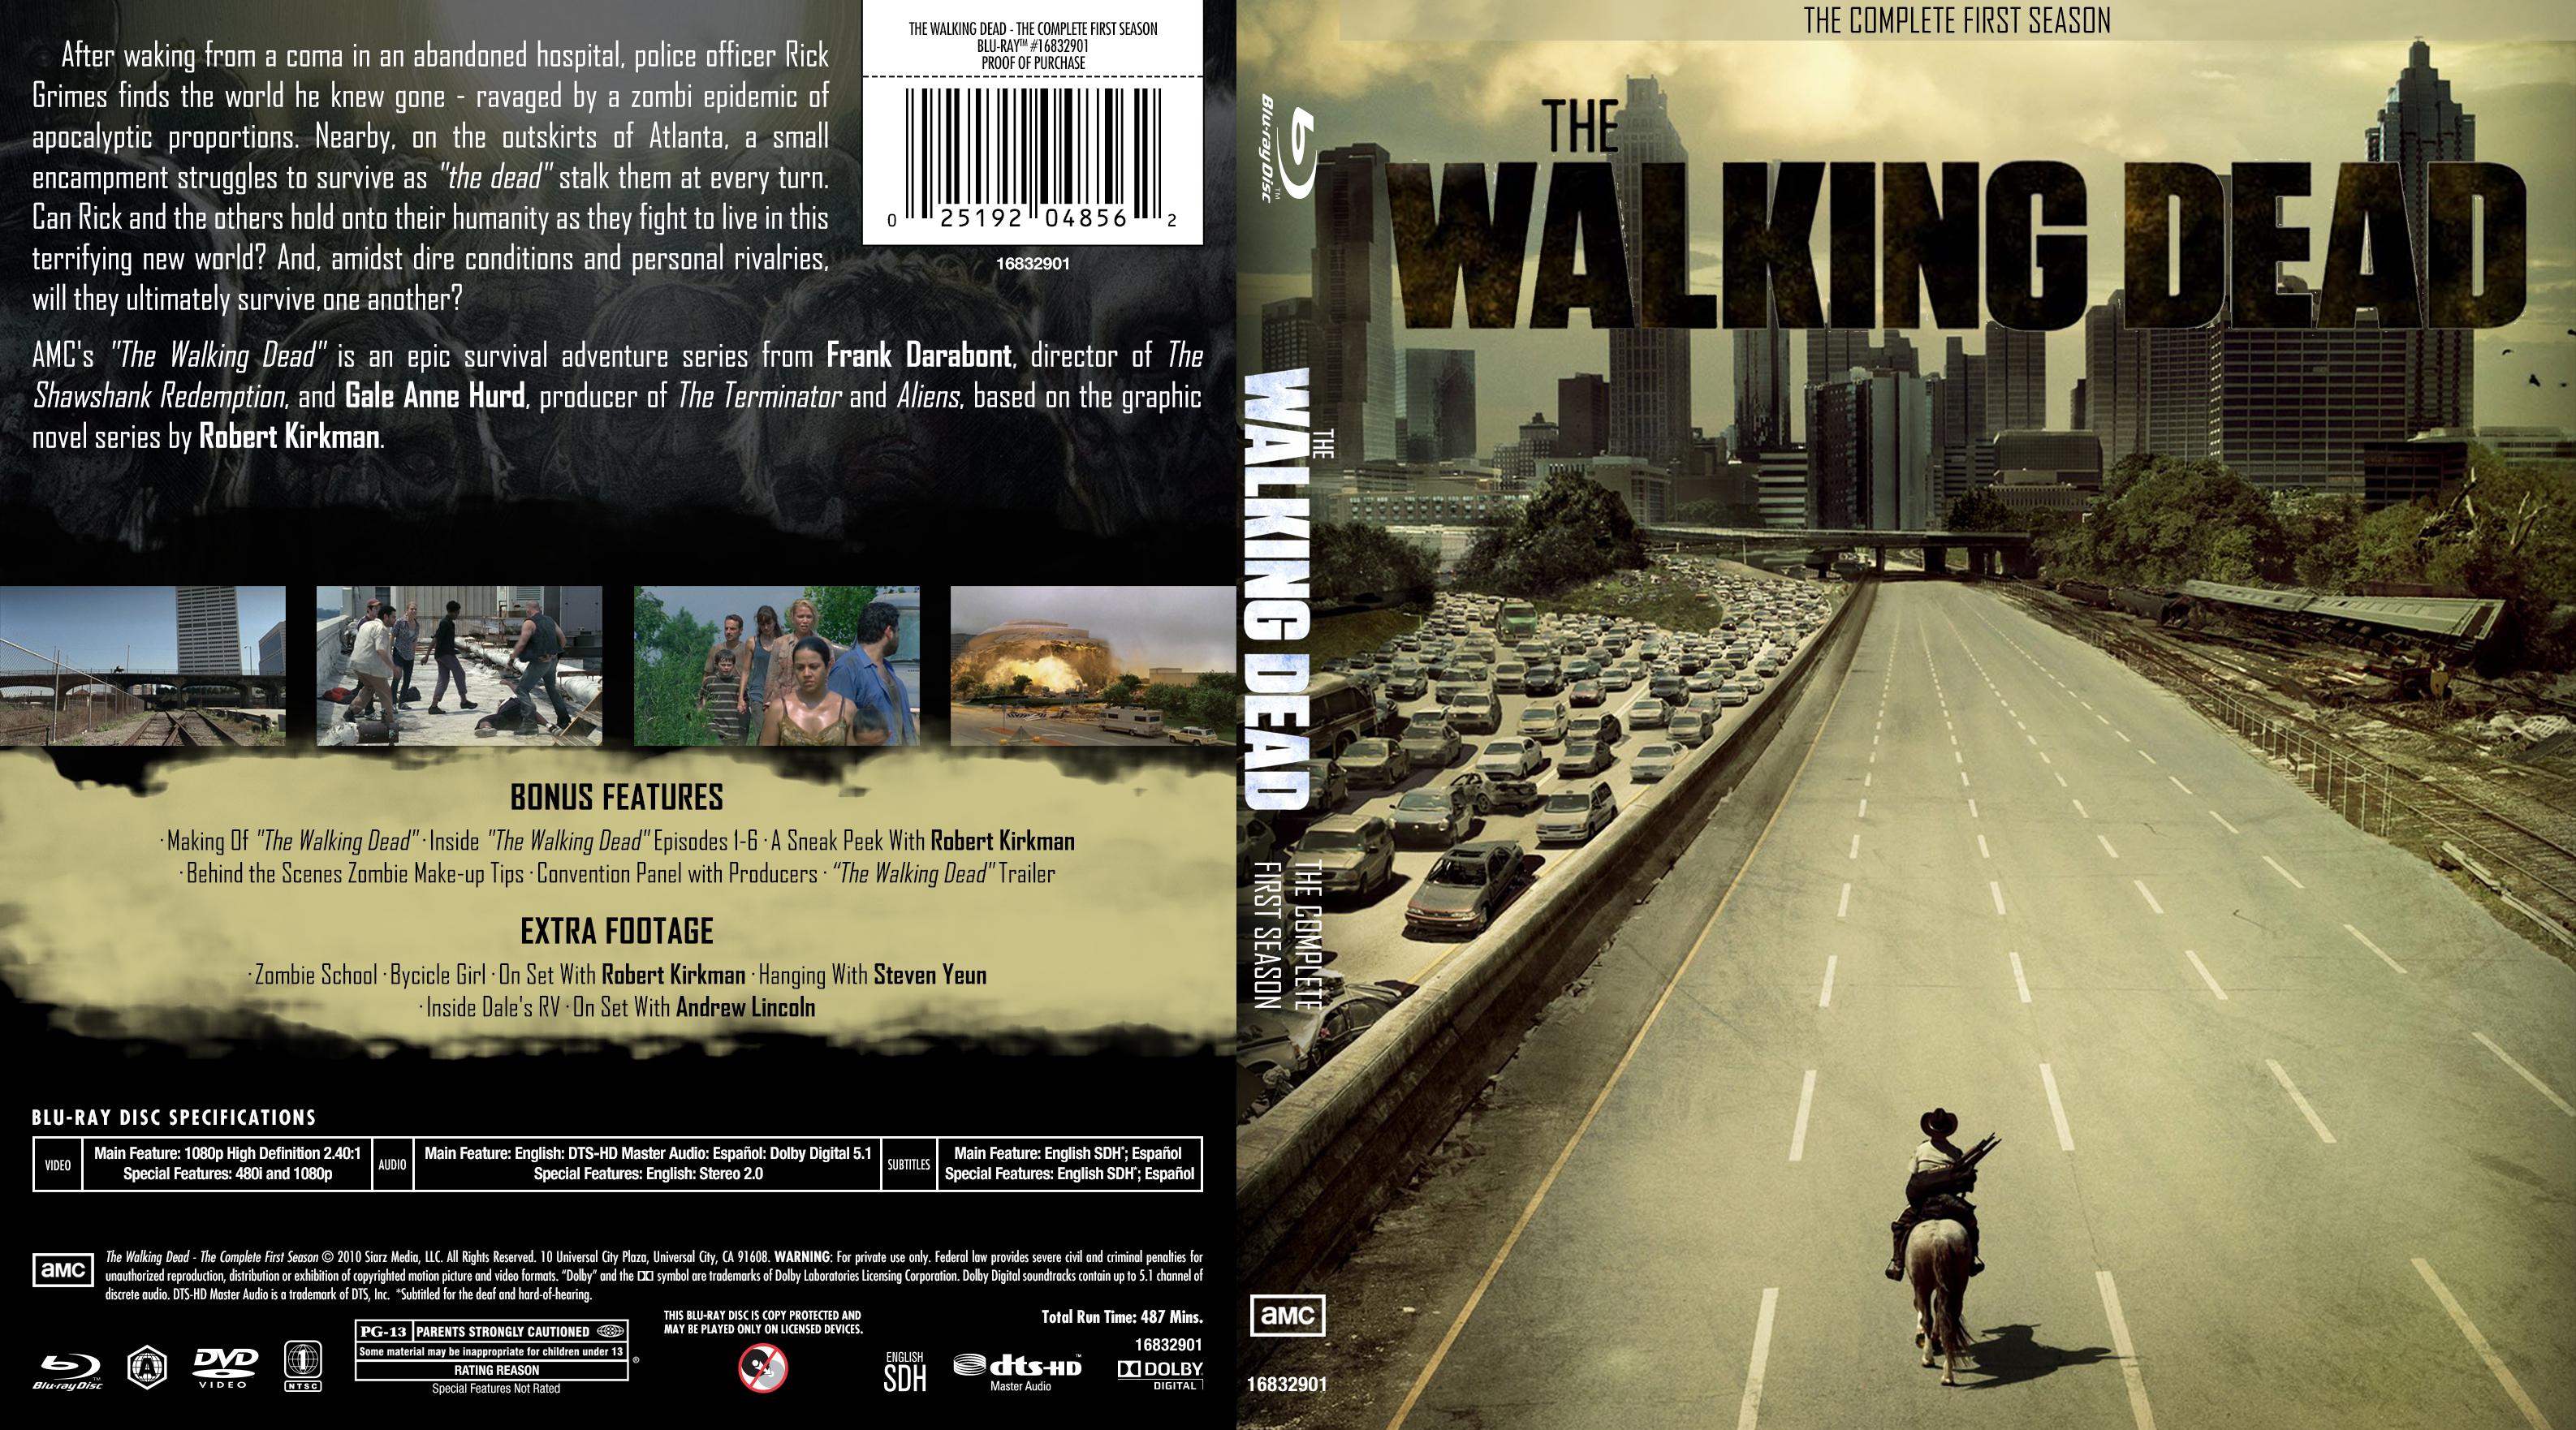 Fear The walking Dead s01 E04 Torrent download